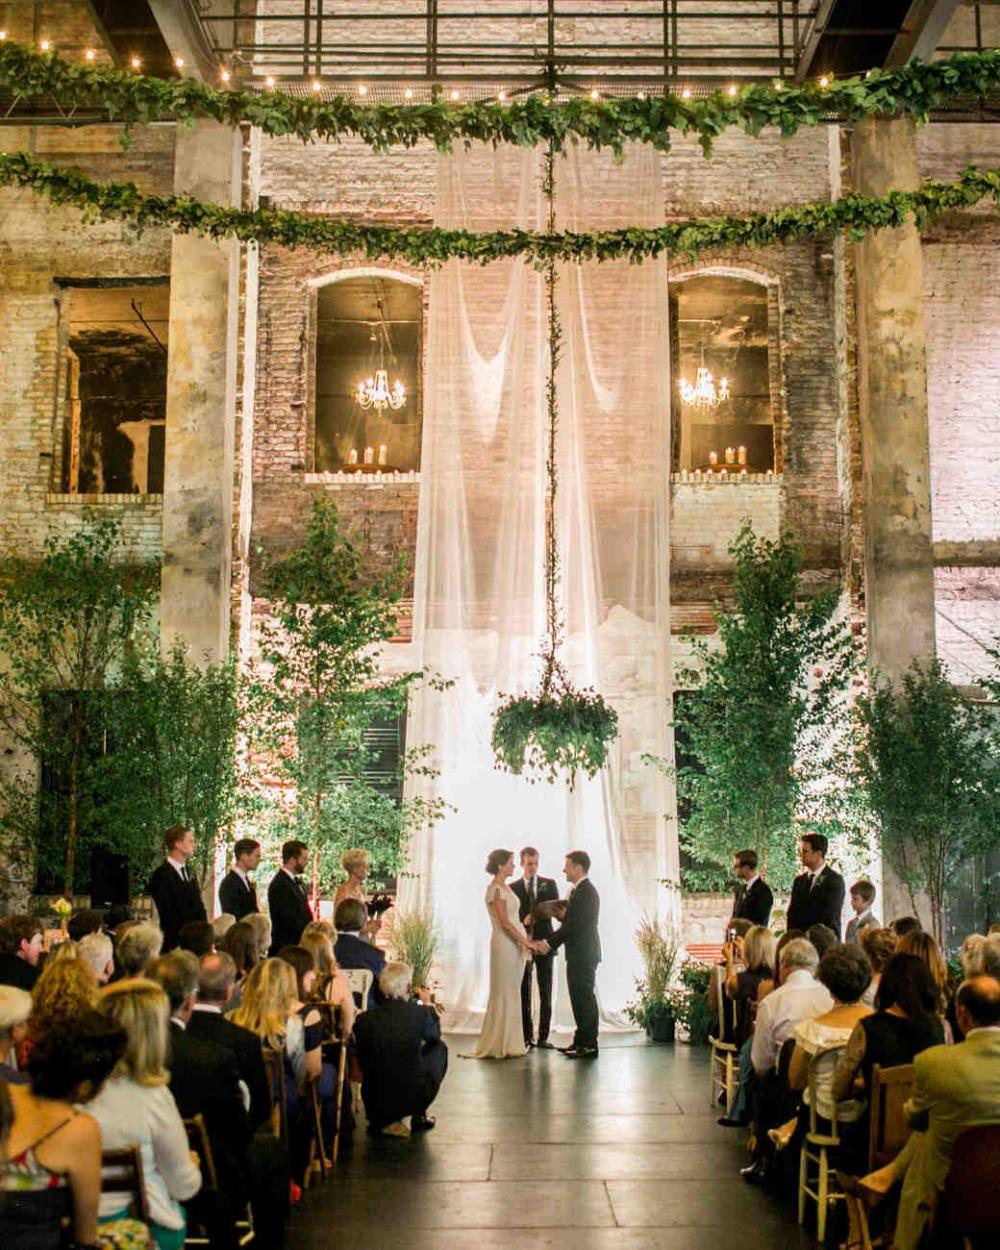 Martha Stewart Weddings Shares 10 of Their Favorite ...